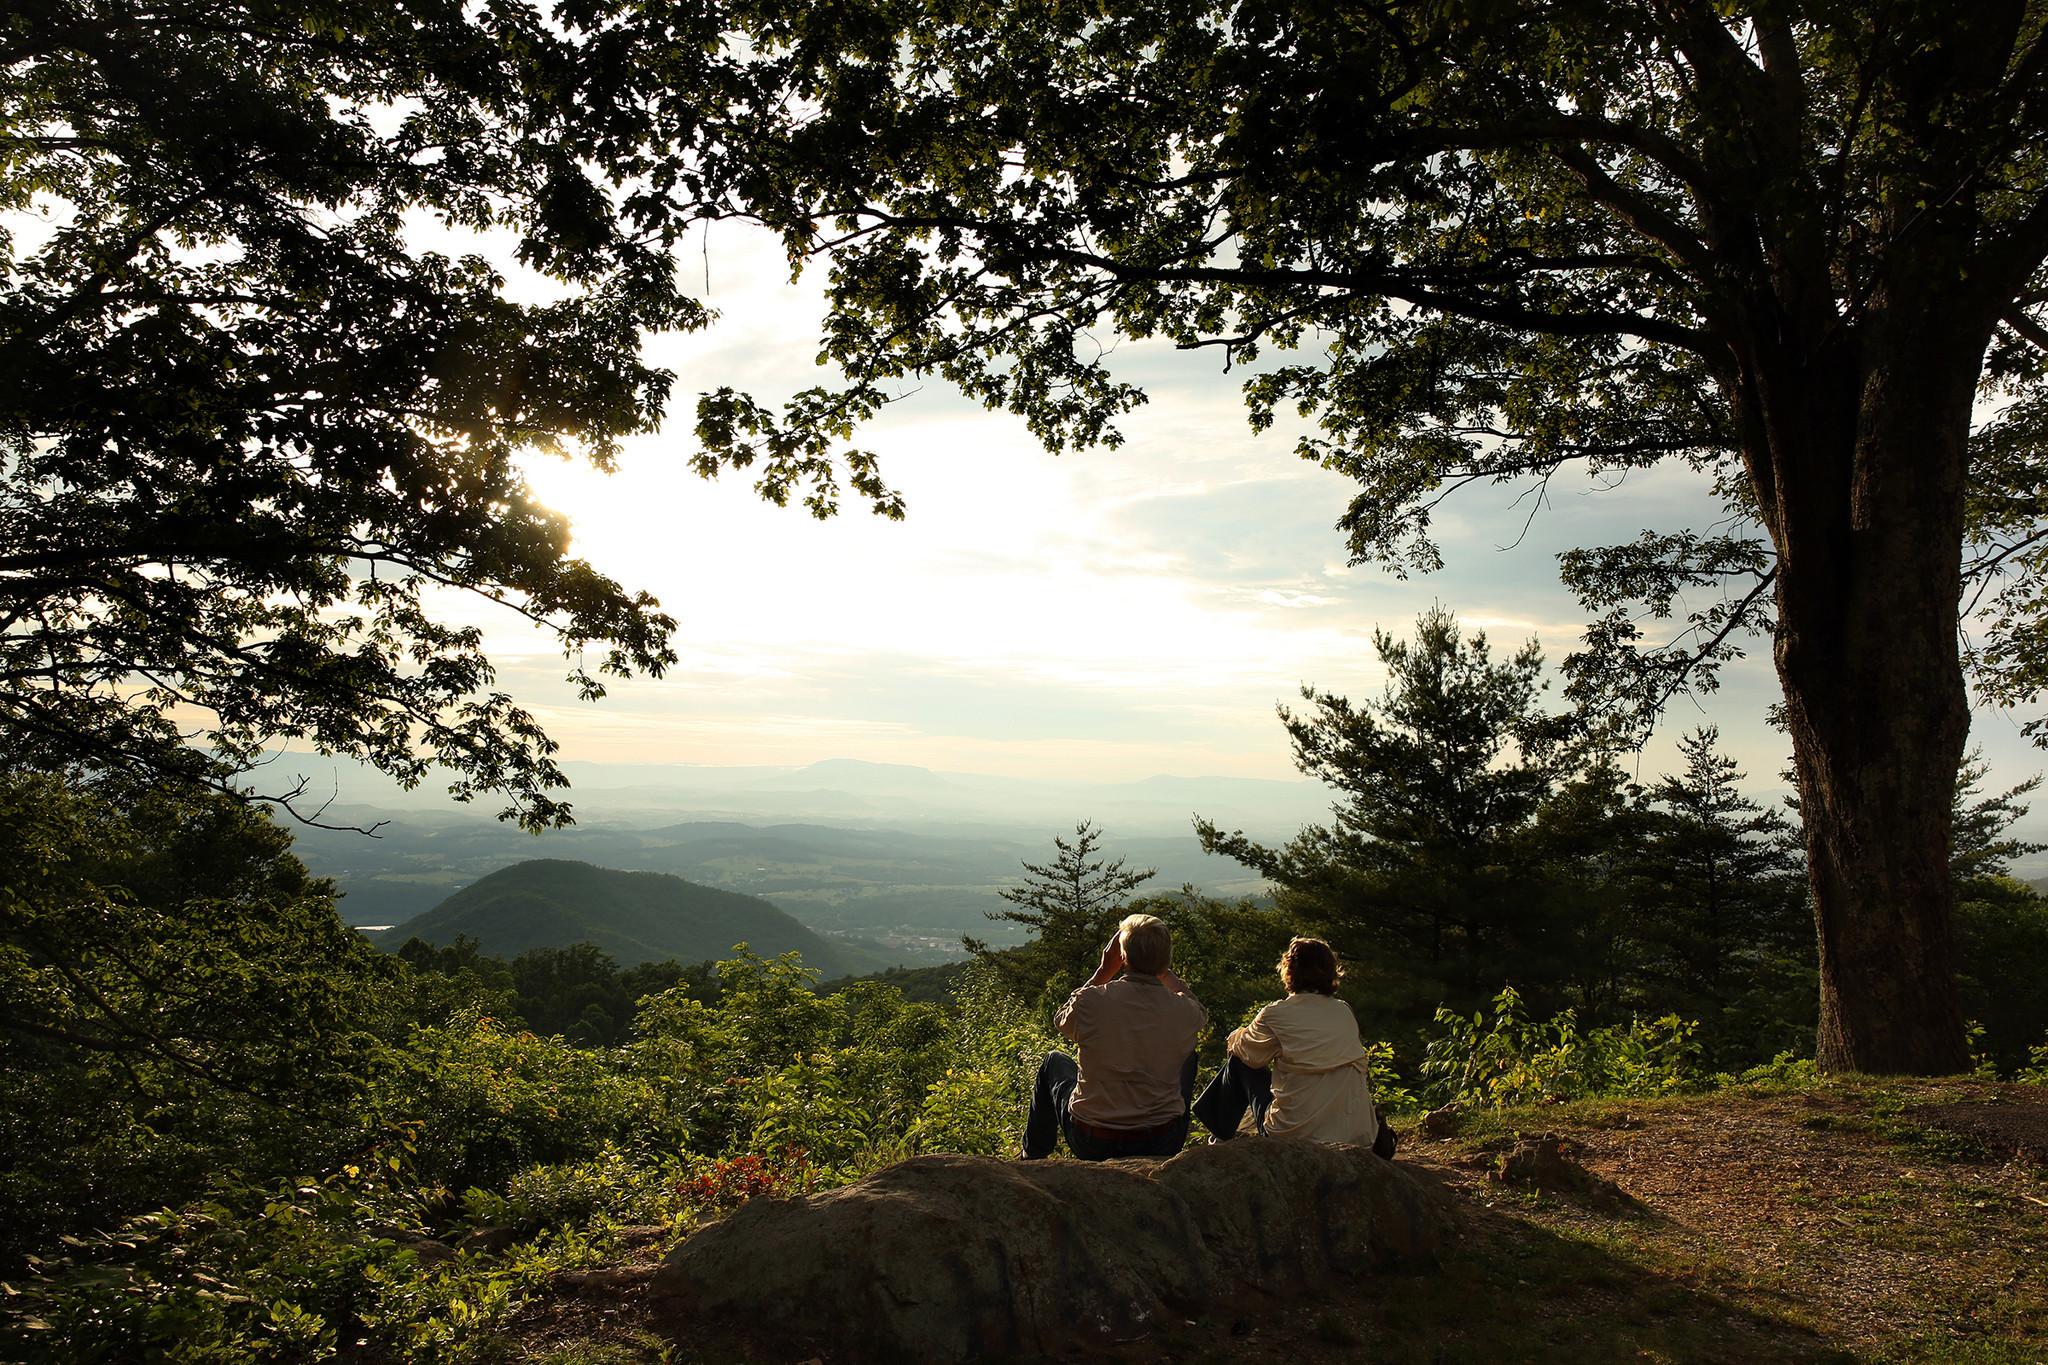 Robert Gorman and Carolyn Portier-Gorman of Thibodaux, La., admire the view from the Blue Ridge Parkway outside Roanoke, Va.